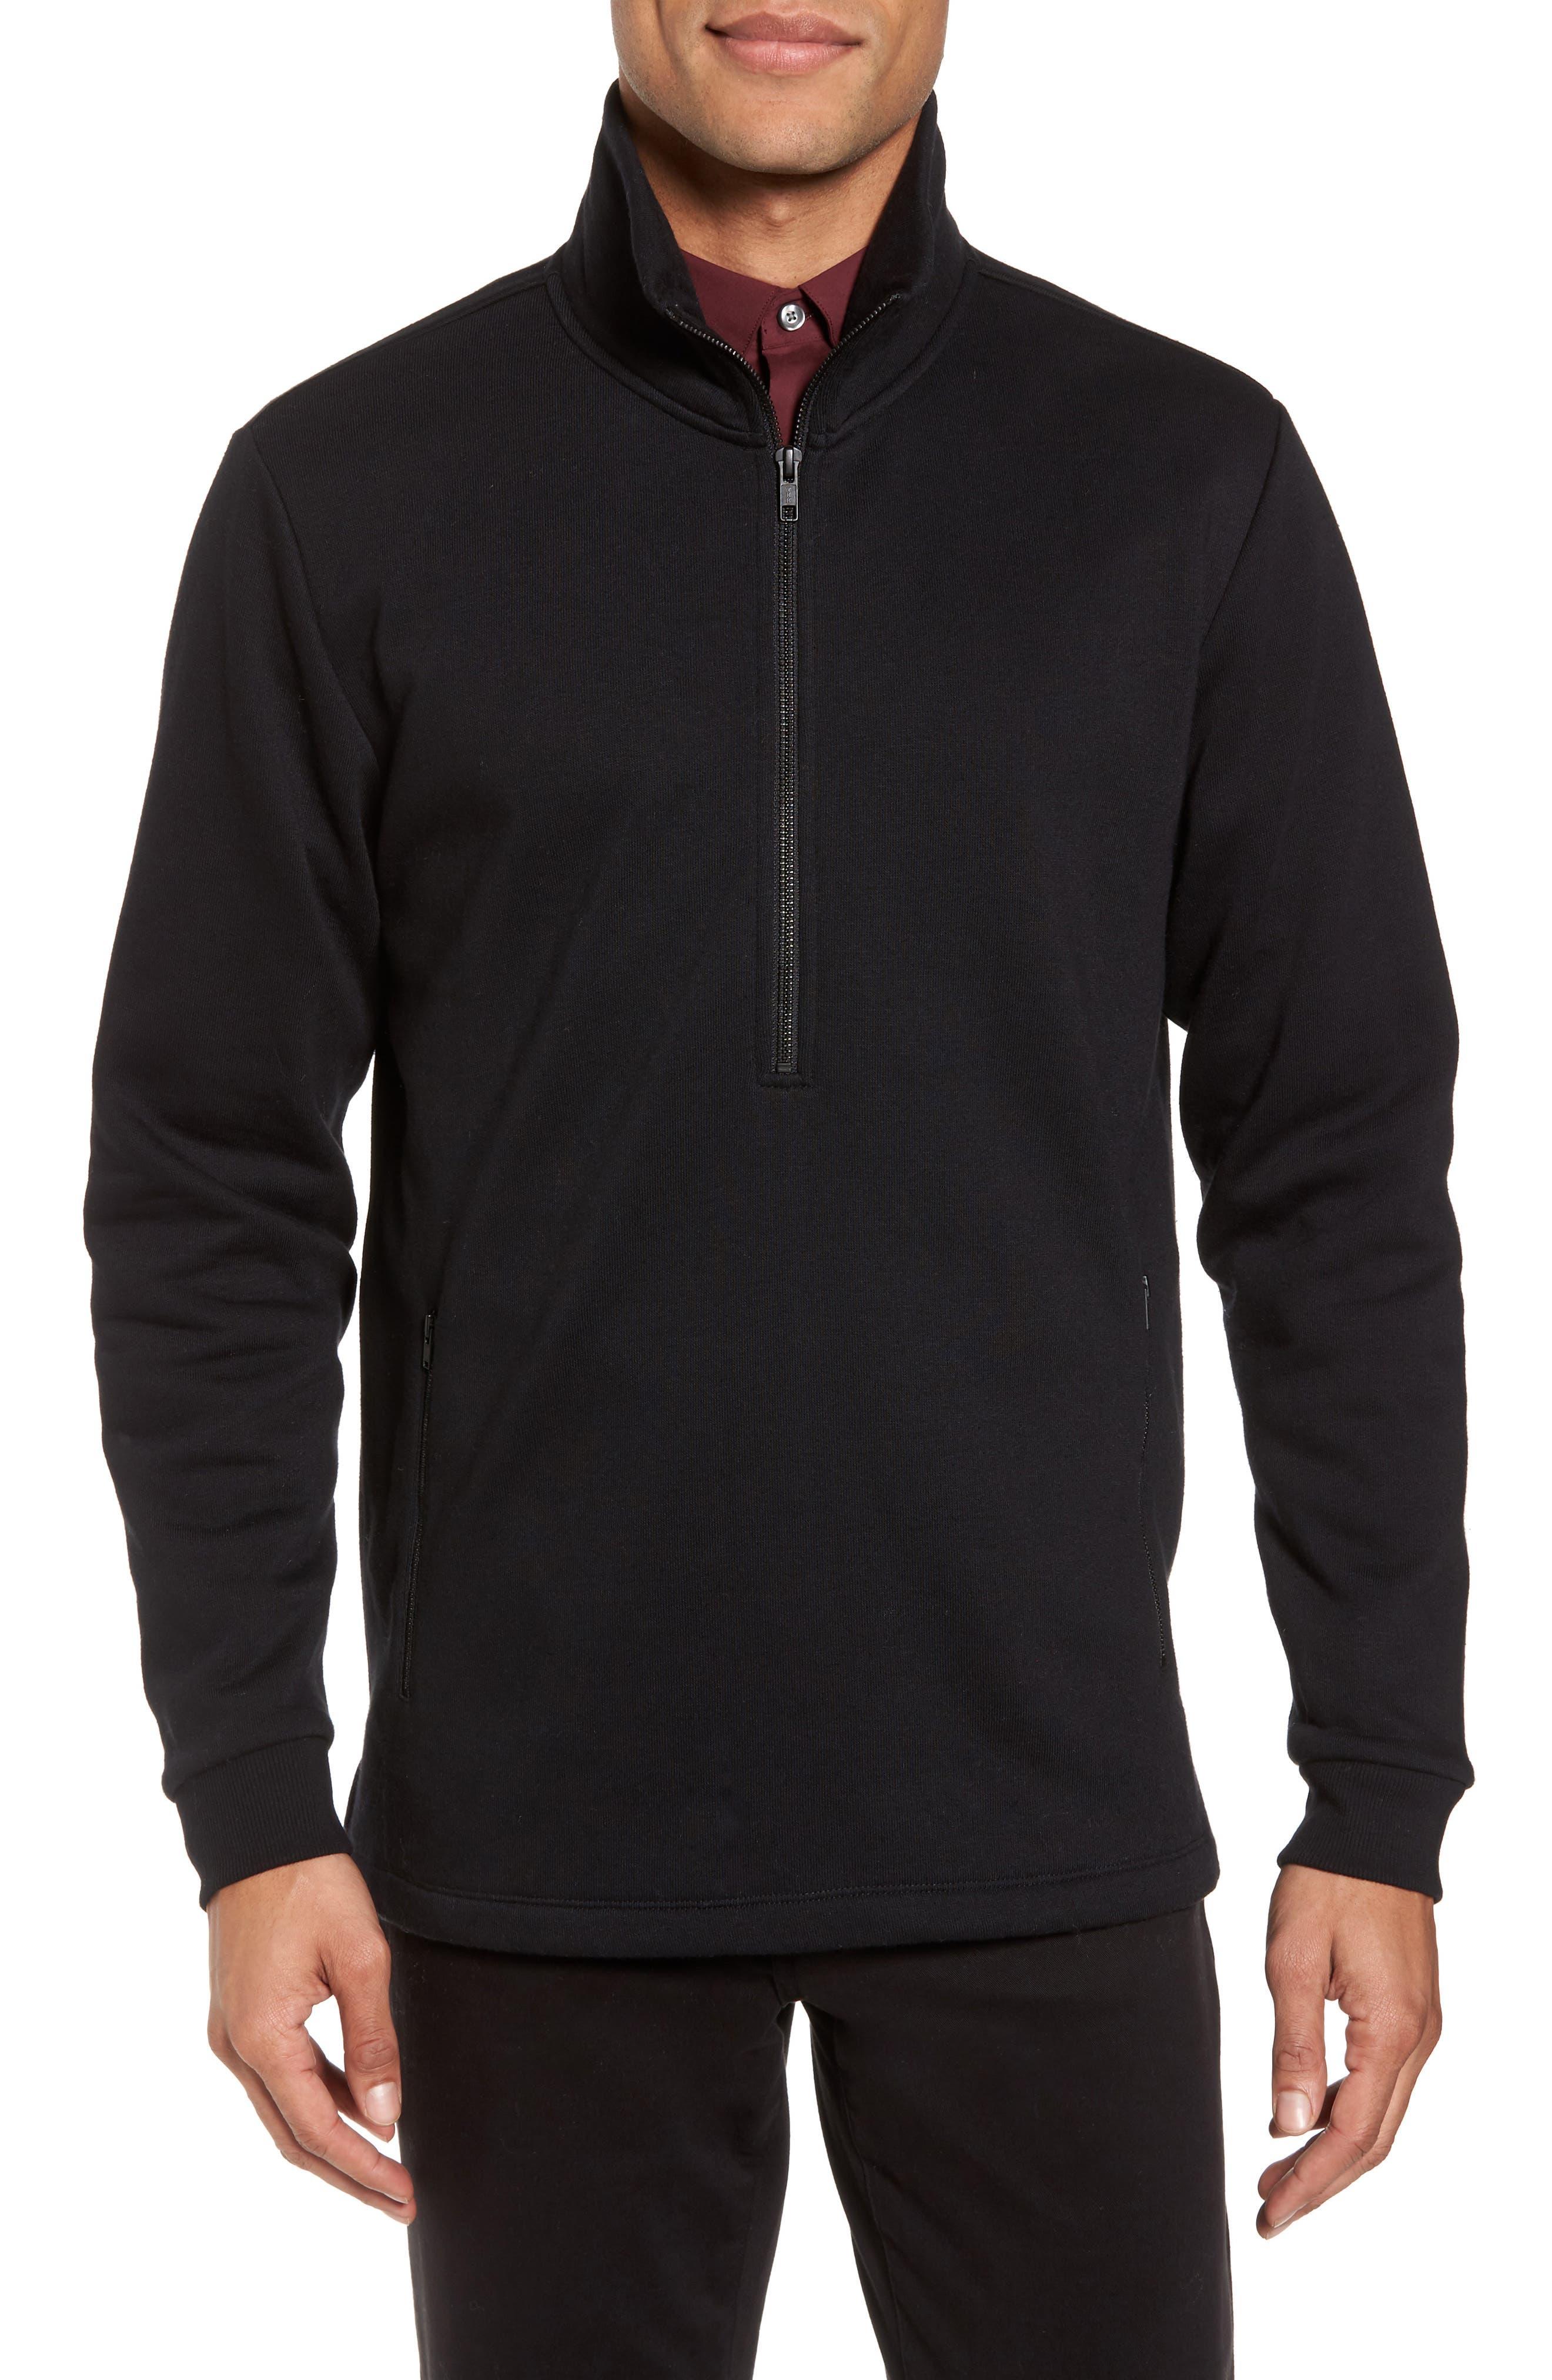 Main Image - Calibrate Quarter Zip Fleece Pullover